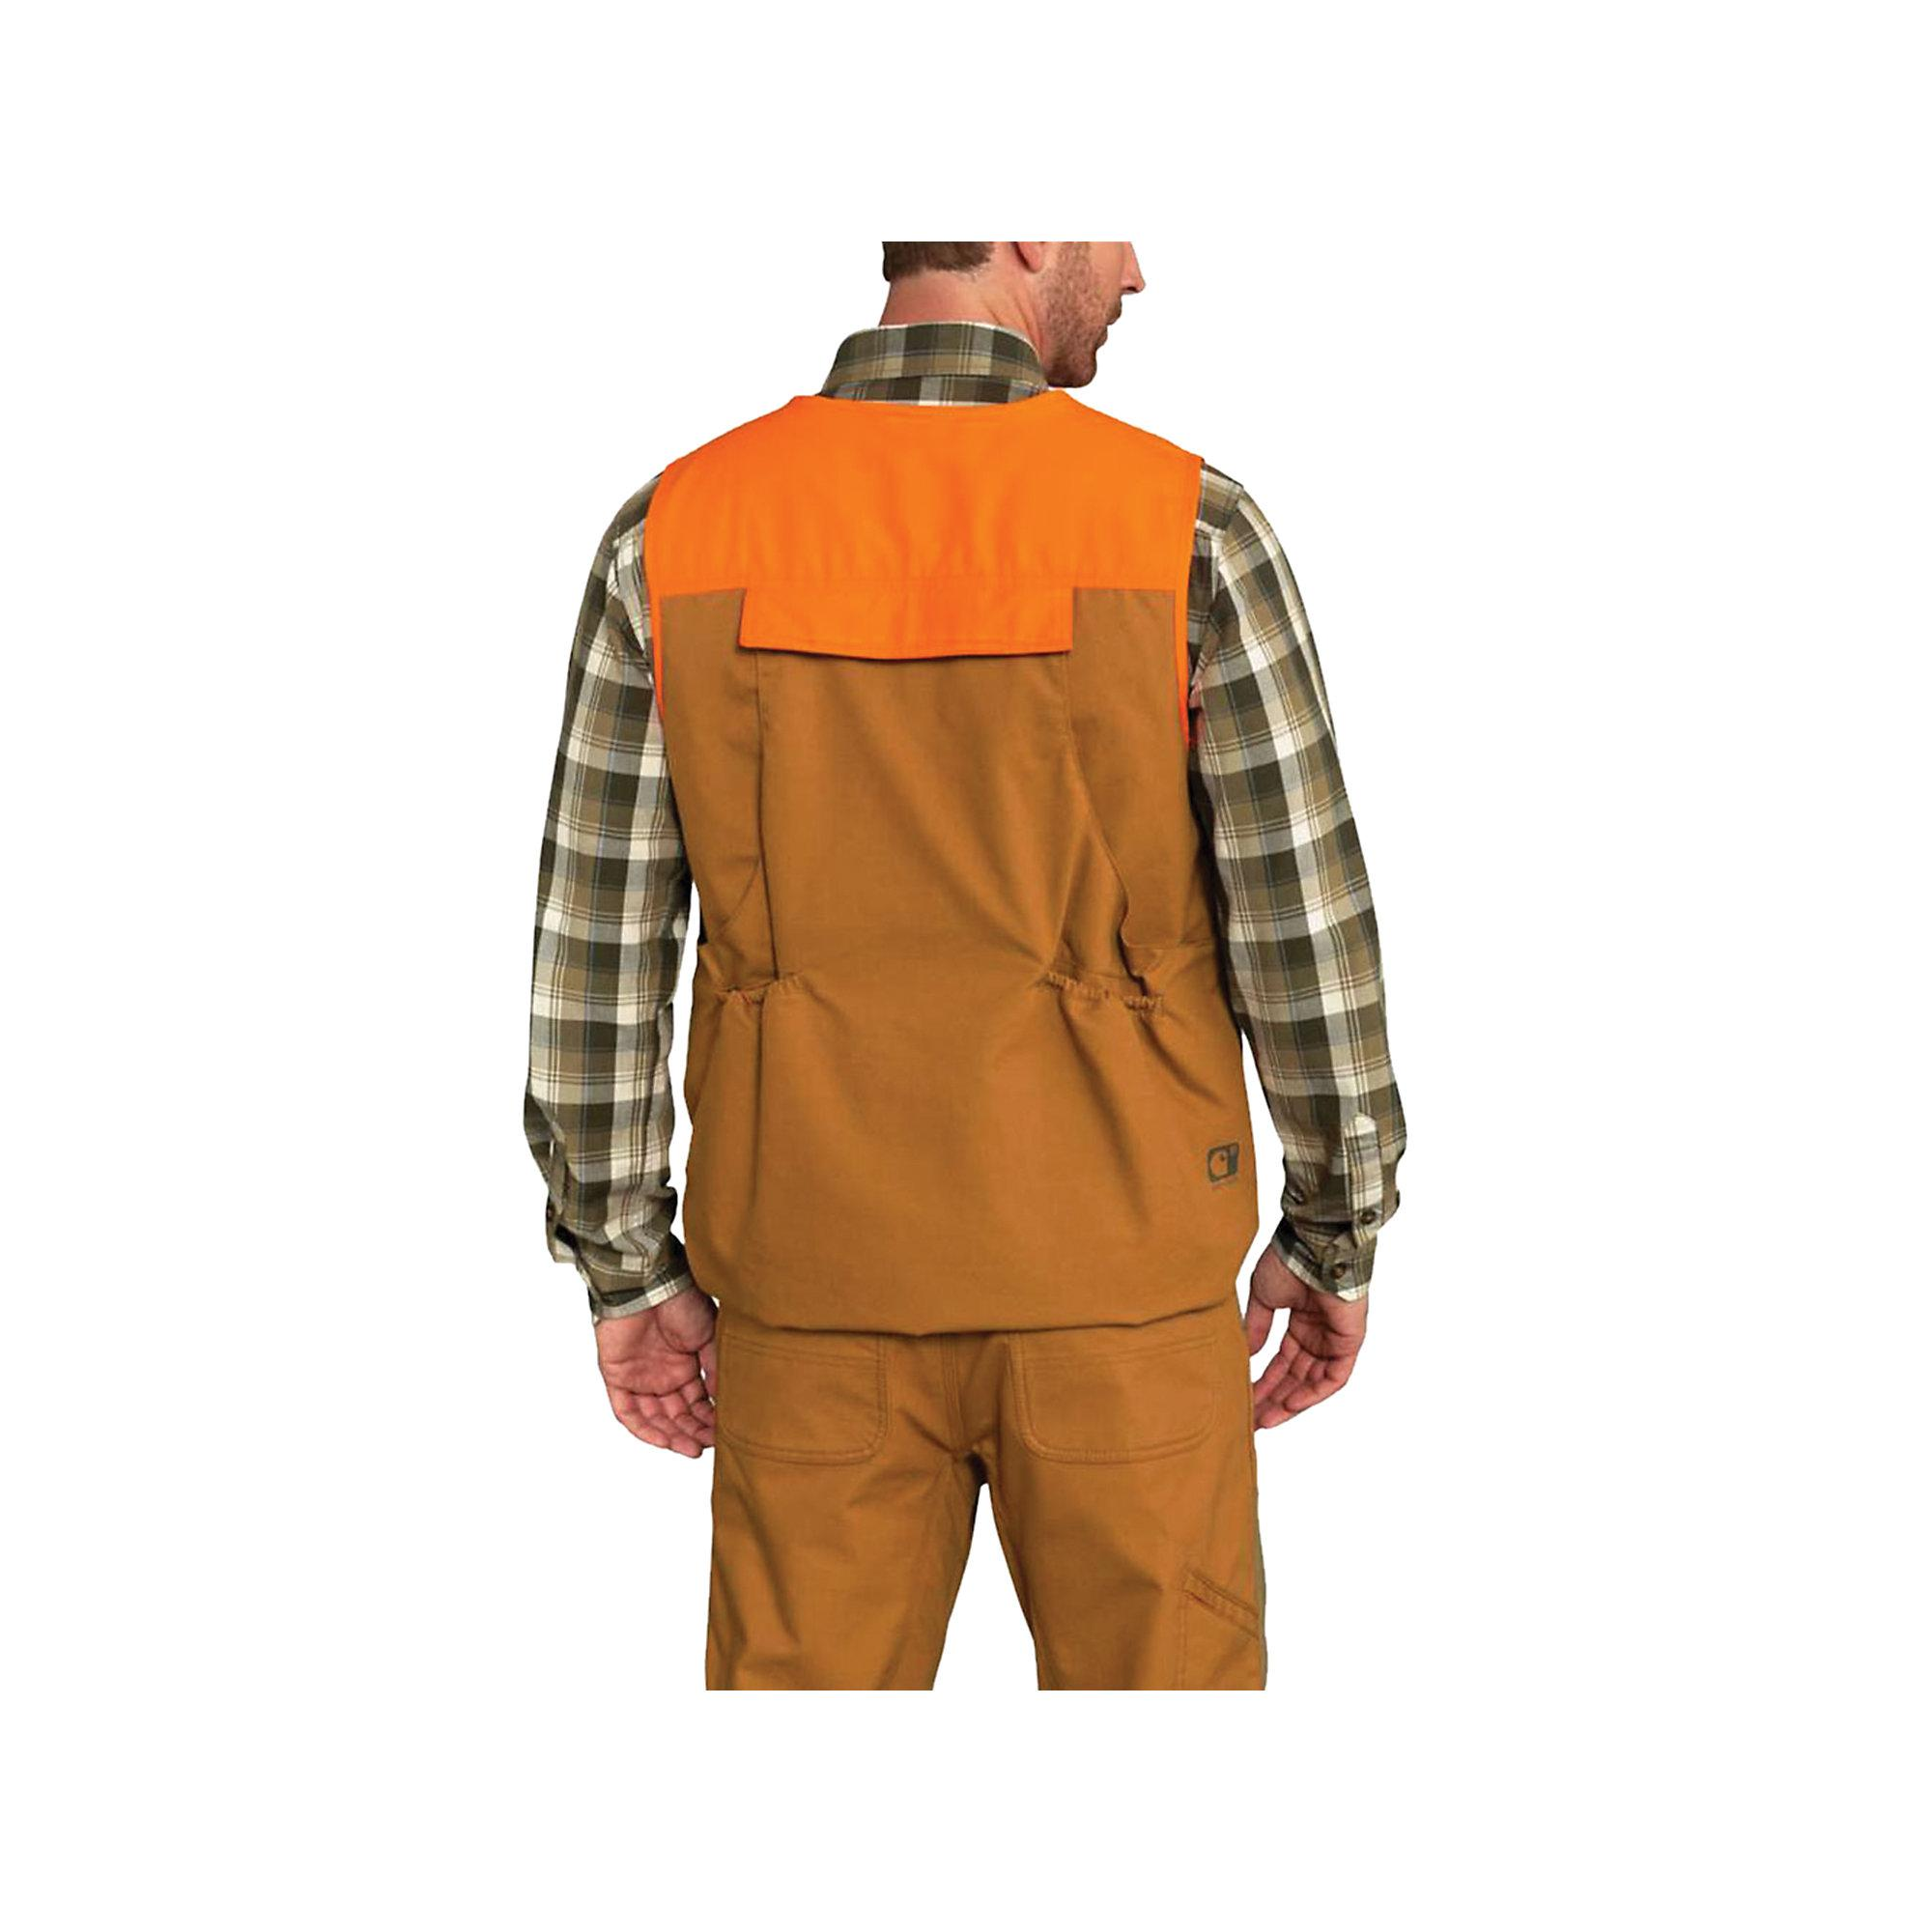 Carhartt Cotton Upland Field Vest In Brown For Men Lyst